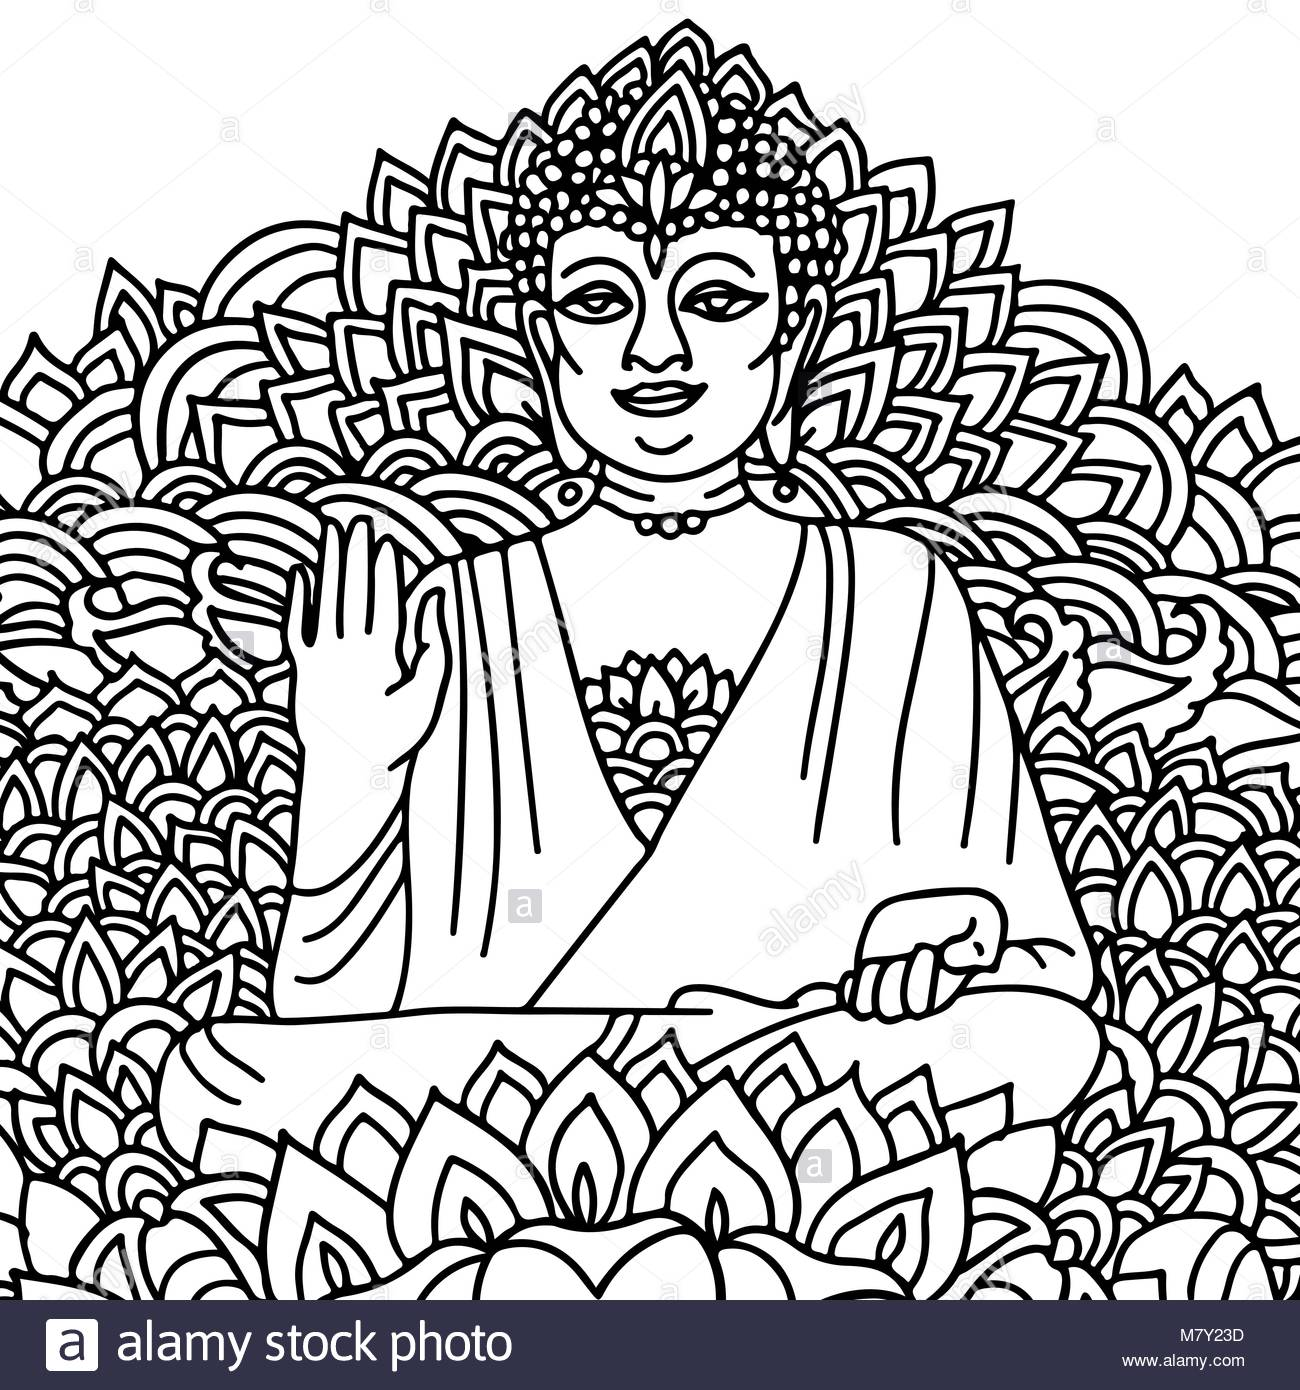 1300x1390 Buddhist Monk Drawing Stock Photos Amp Buddhist Monk Drawing